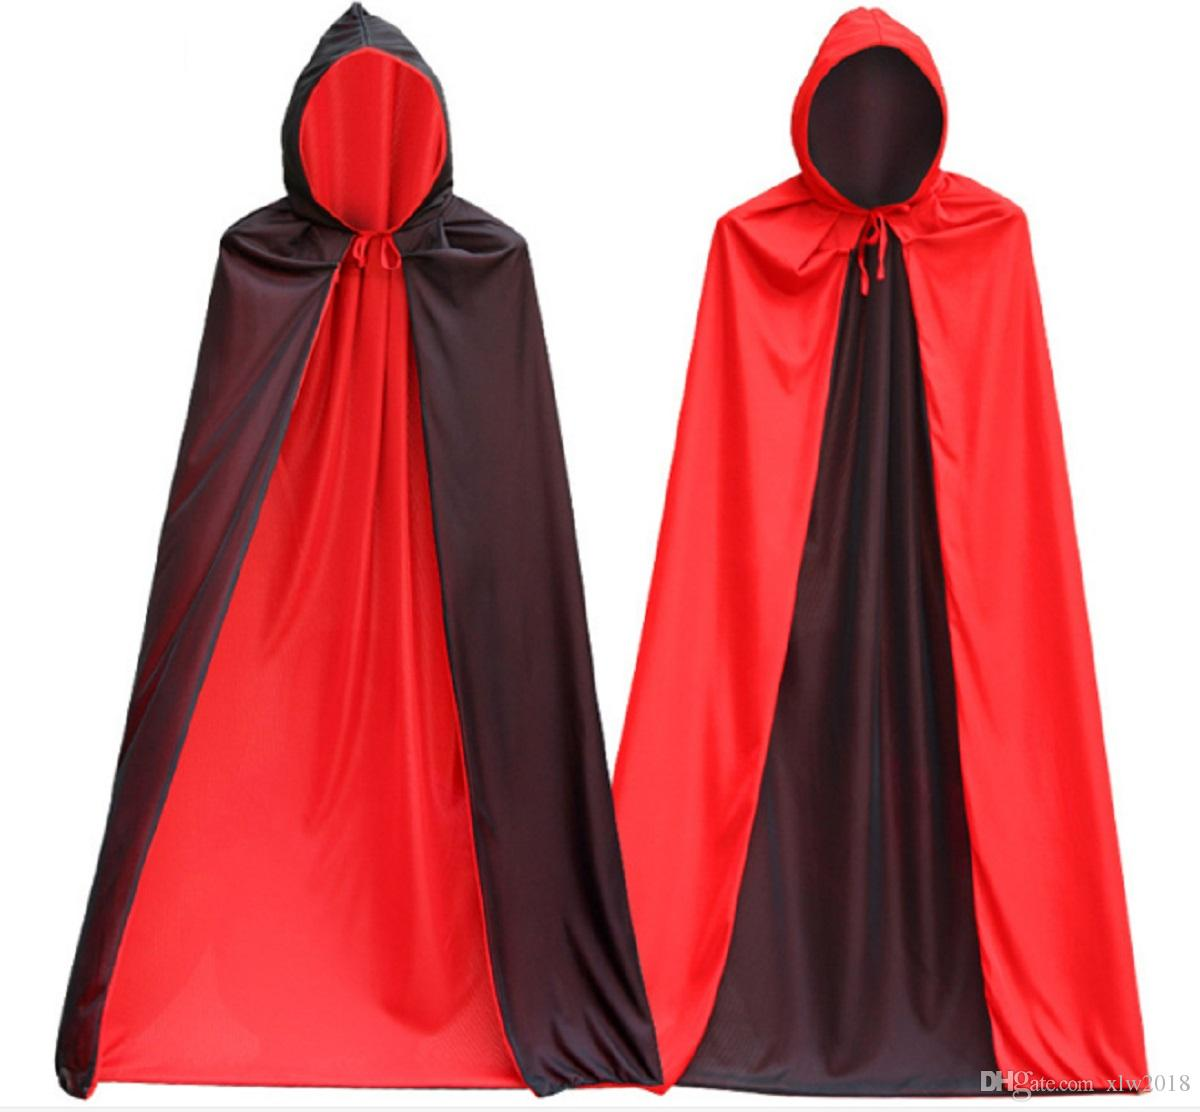 "45/"" RED SATIN POLYESTER CAPE DEVIL VAMPIRE MAGICIAN HALLOWEEN COSTUME ACCESSORY"